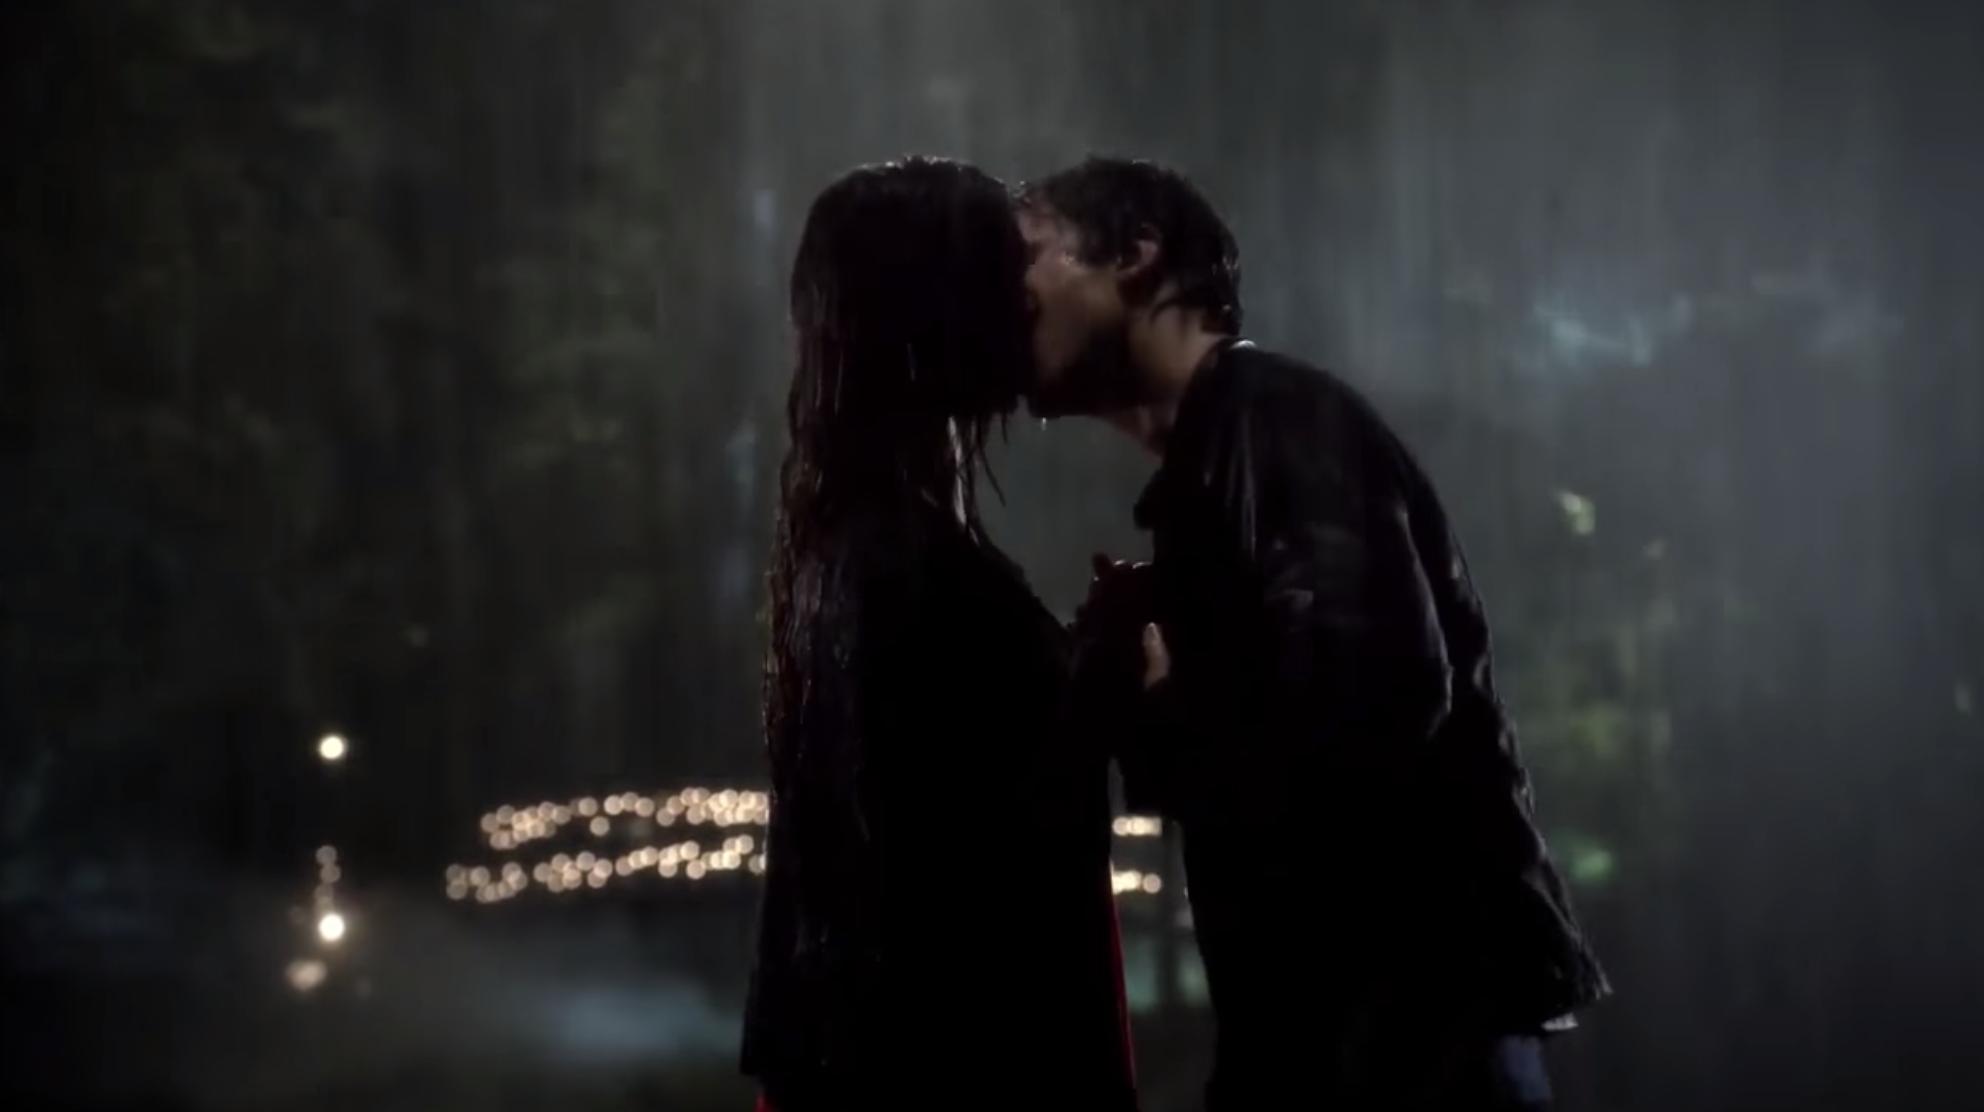 Elena and Damon kissing in the rain.